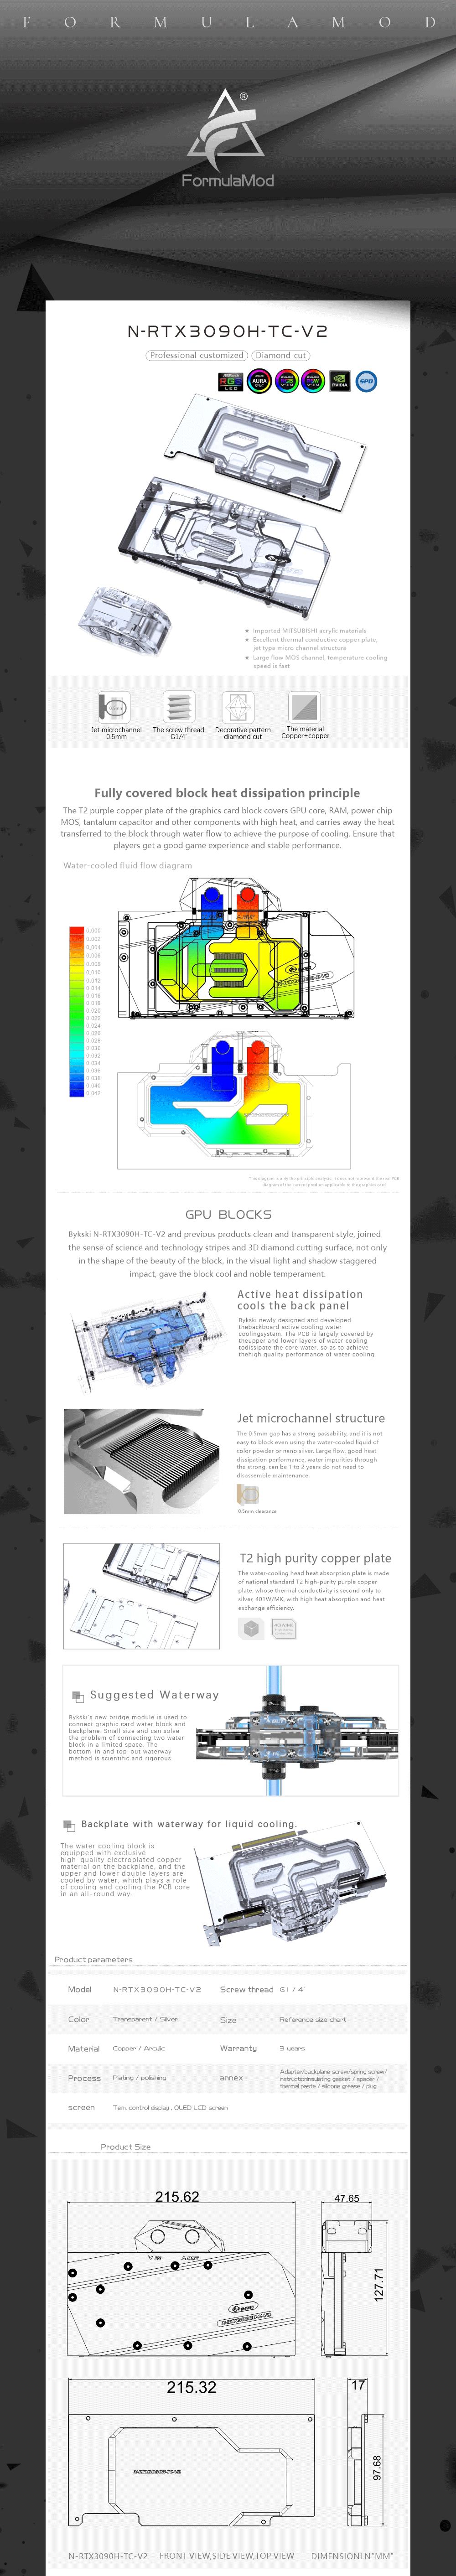 Bykski GPU Block With Active Waterway Backplane Cooler For Galax Palit KFA2 Maxsun Gainward etc. AIC RTX 3090 3080 N-RTX3090H-TC-V2